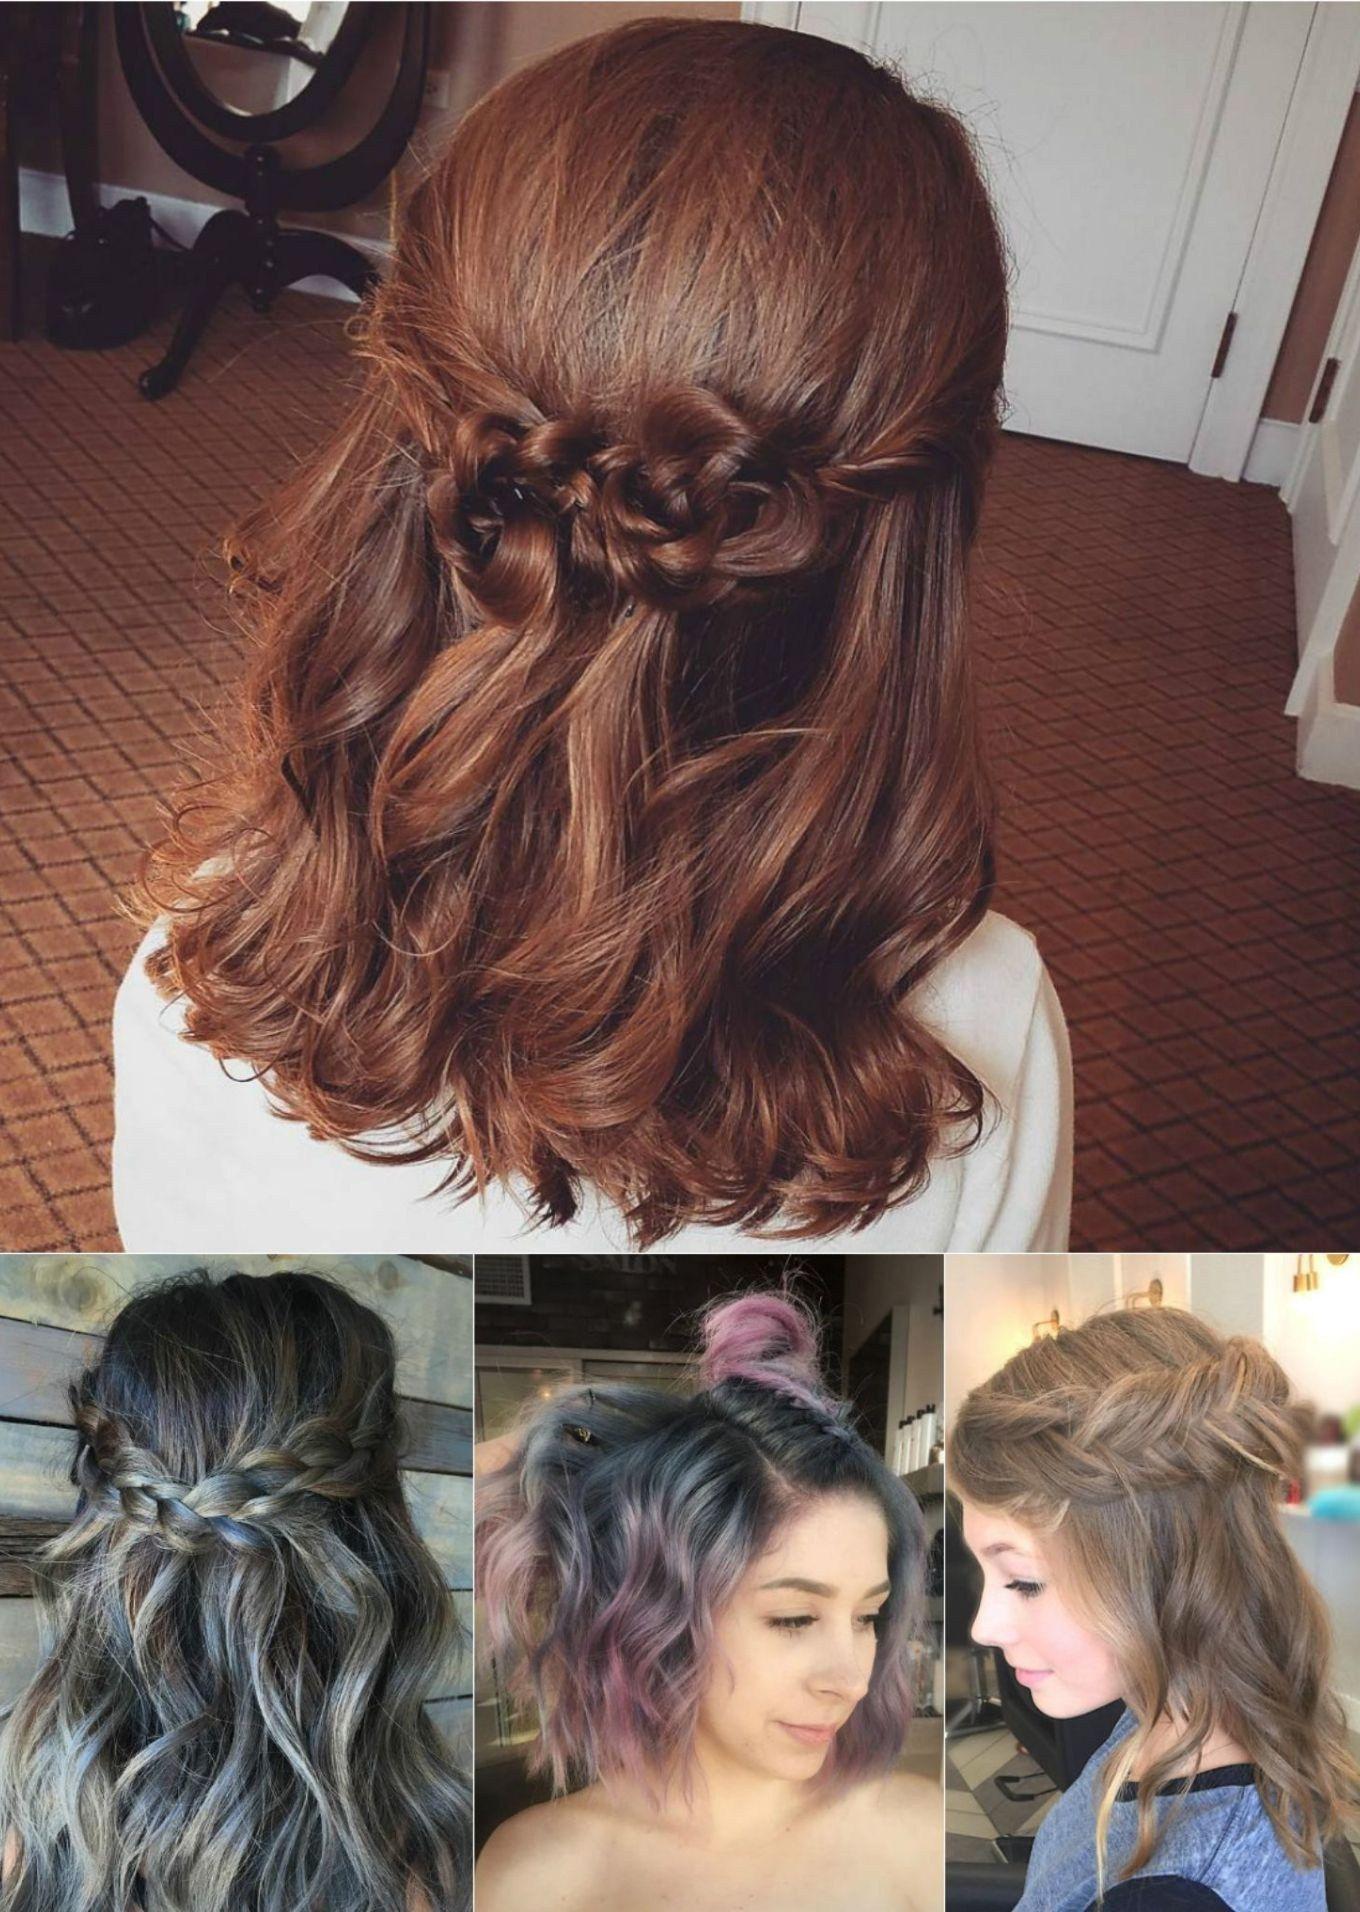 Hairstyles For Medium Hair Wedding Guest Elegant - easy wedding